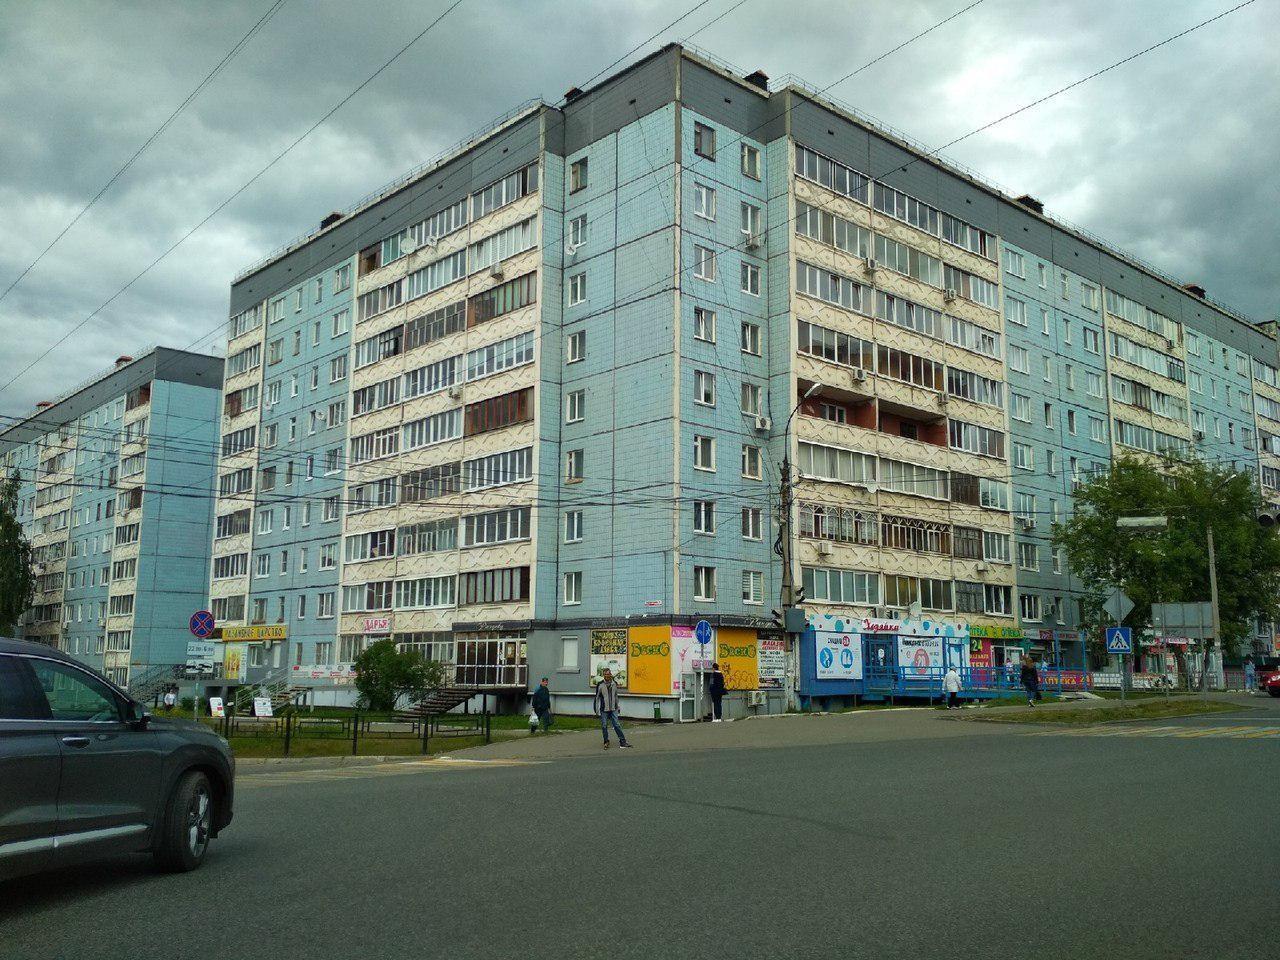 Дом 19 по улице Холмогорова, где произошло убийство. Фото © Ирина Бурцева